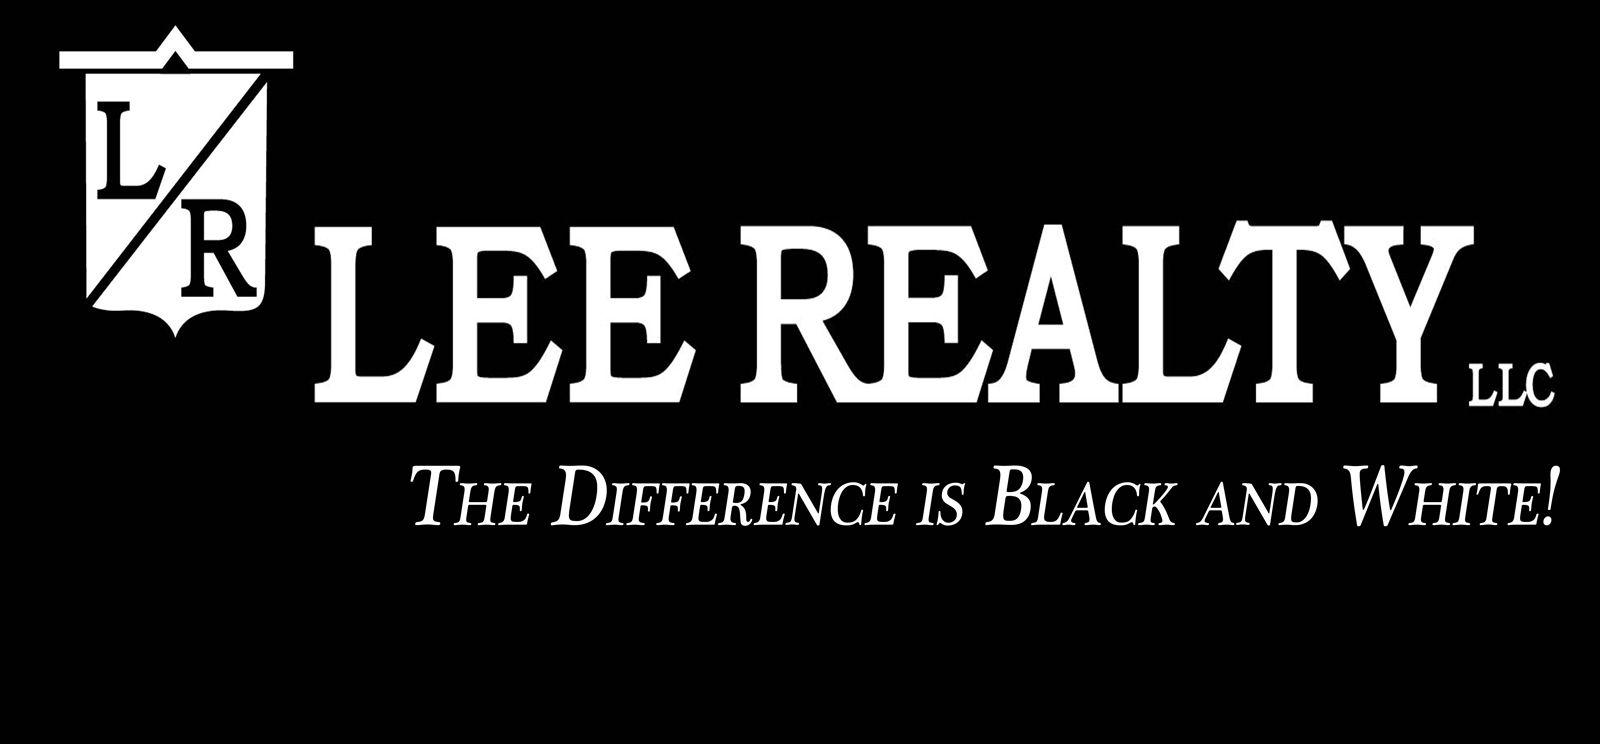 Lee Realty, LLC